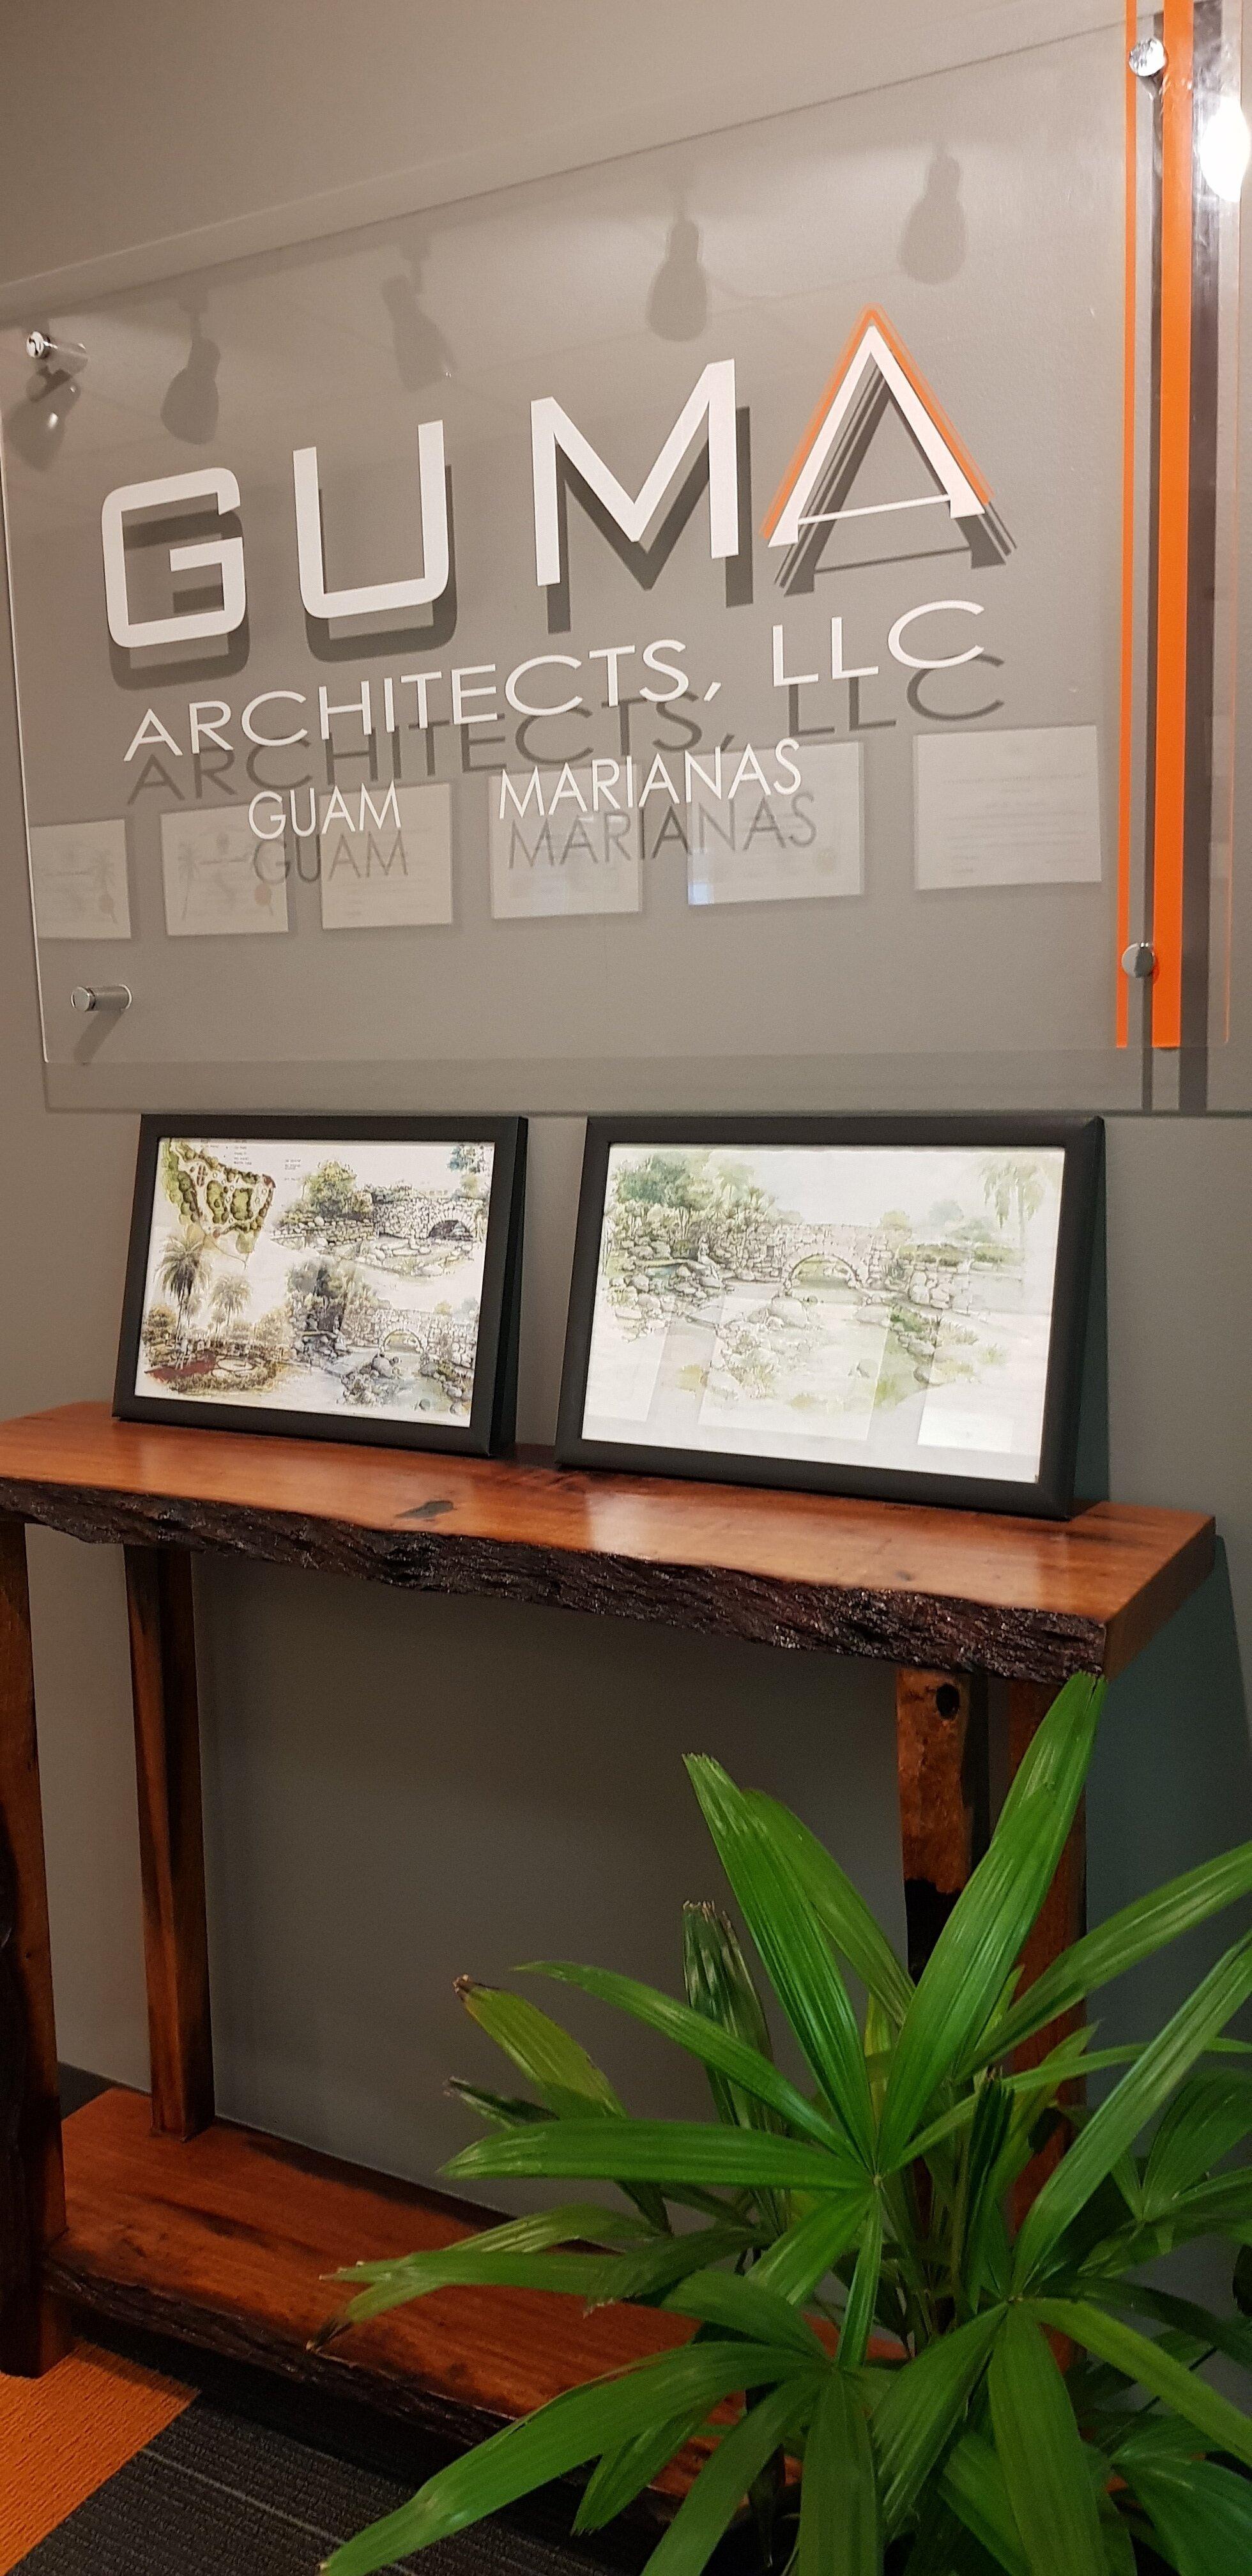 About Guma Architects Llc